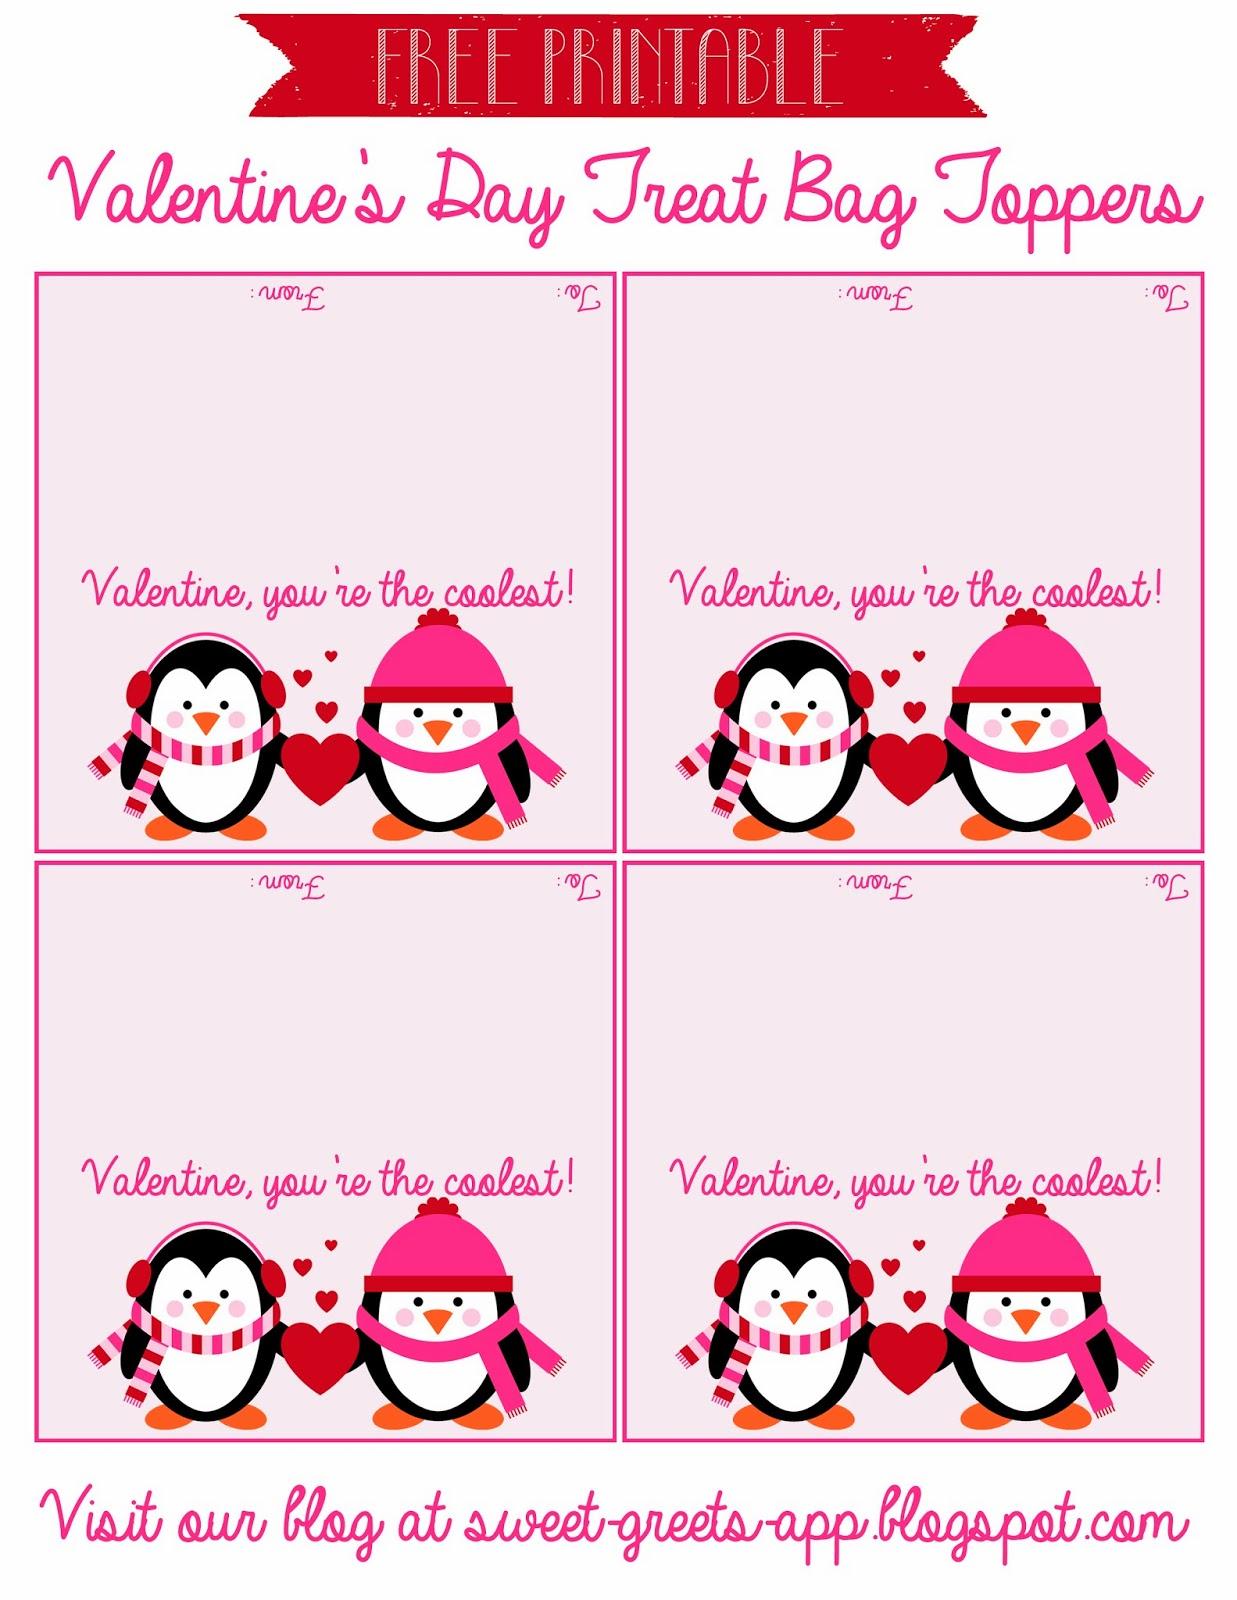 35 Printable Valentines Labels amp PSD Designs  Templatenet